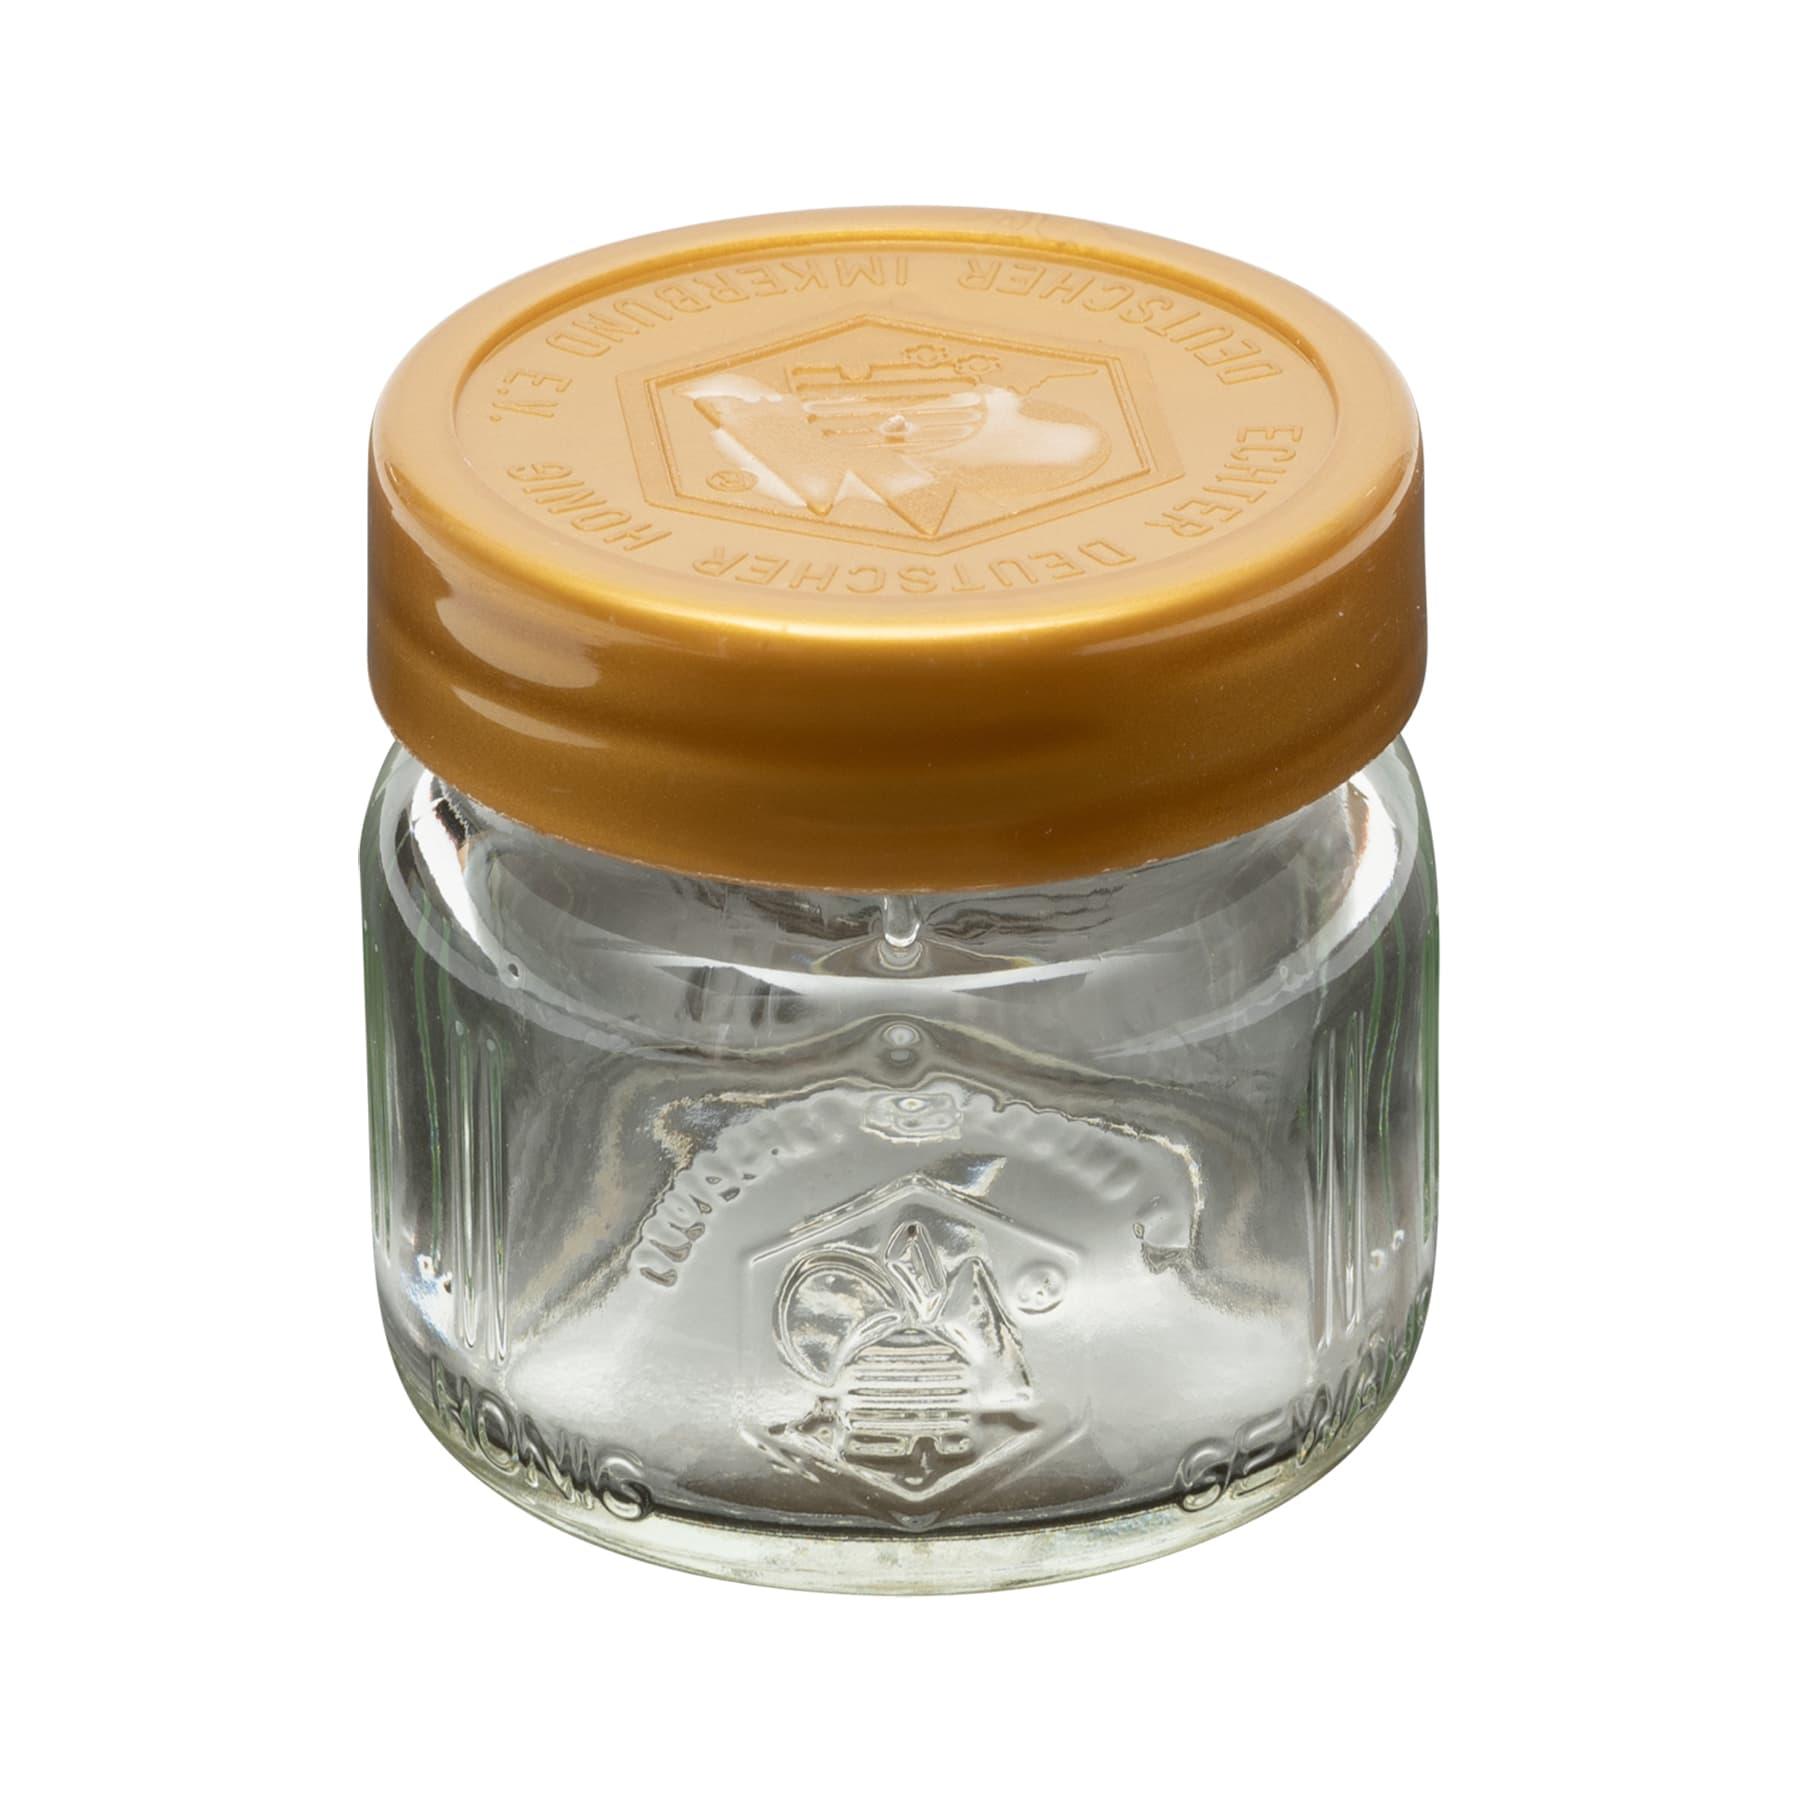 DIB - Glas 30 g inkl. Deckel, 60 Stück in Folie